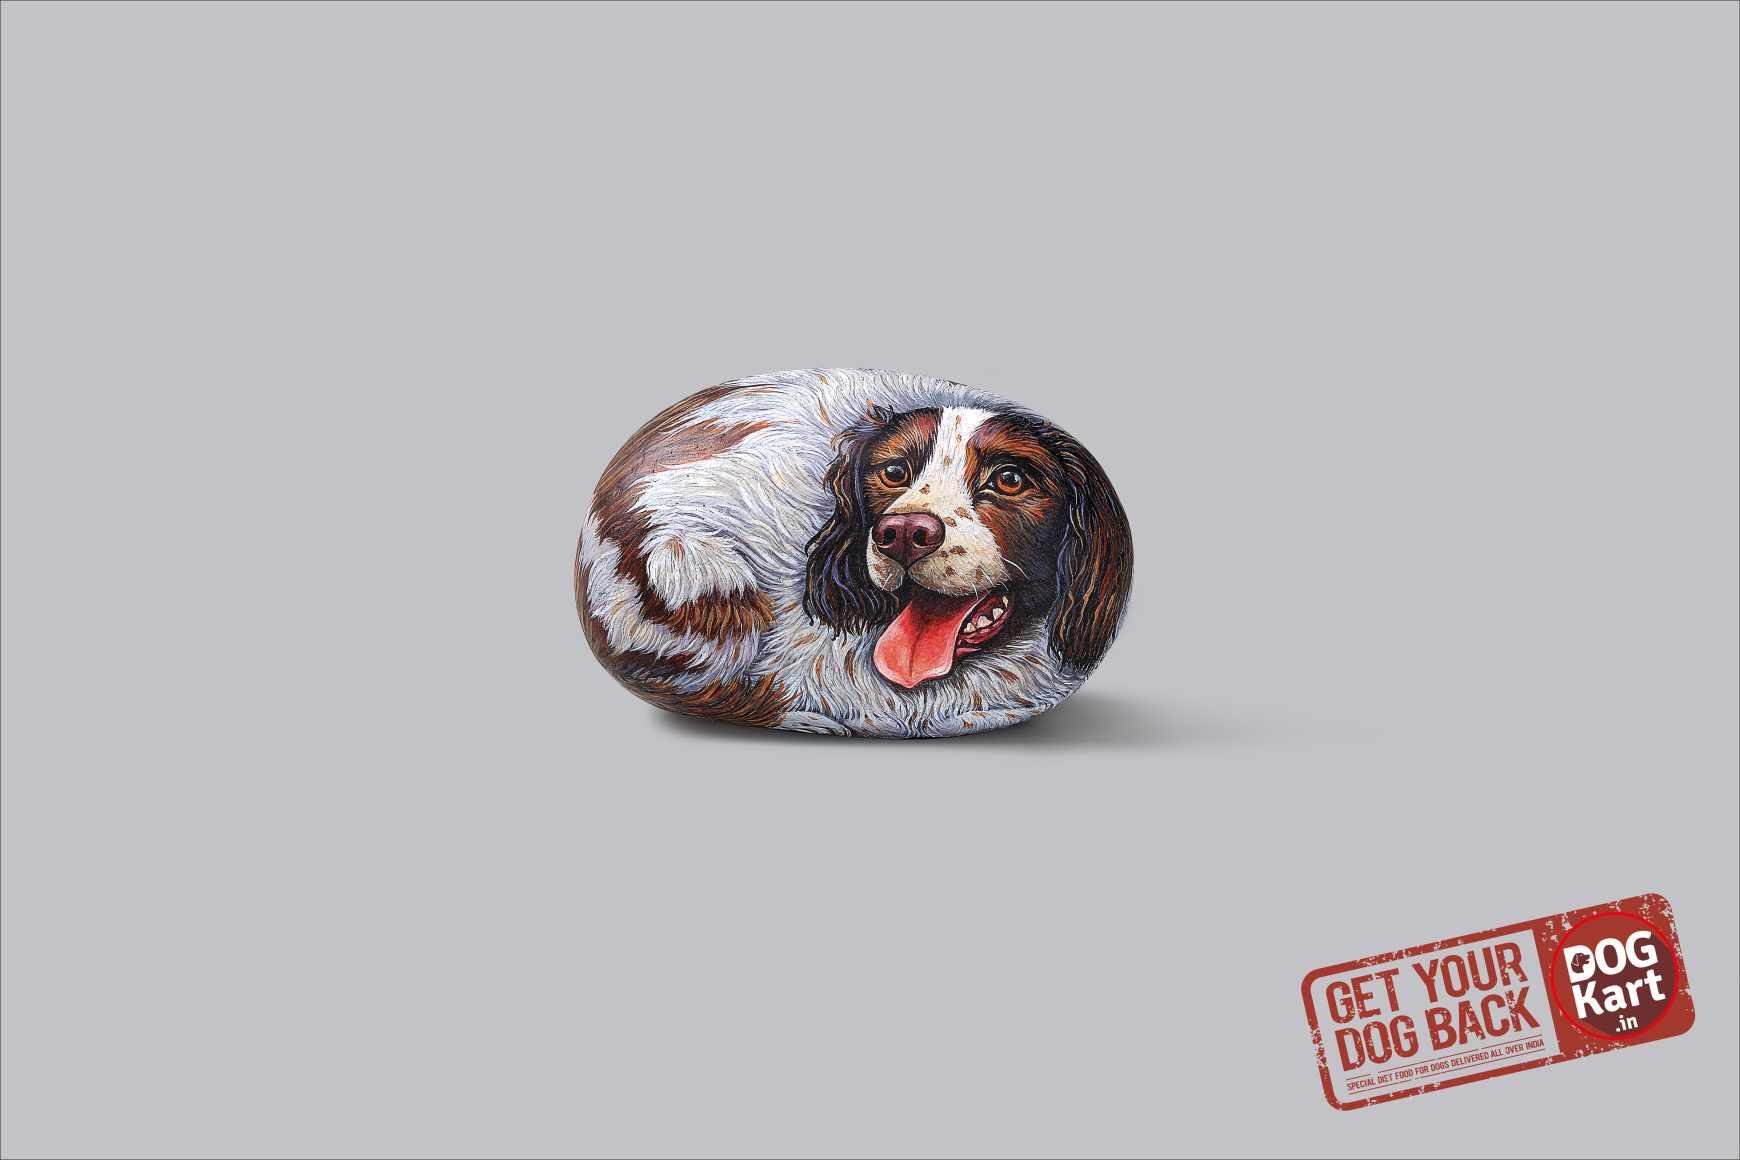 Dogkart Print Ad - Rock Heavy - Cocker Spaniel